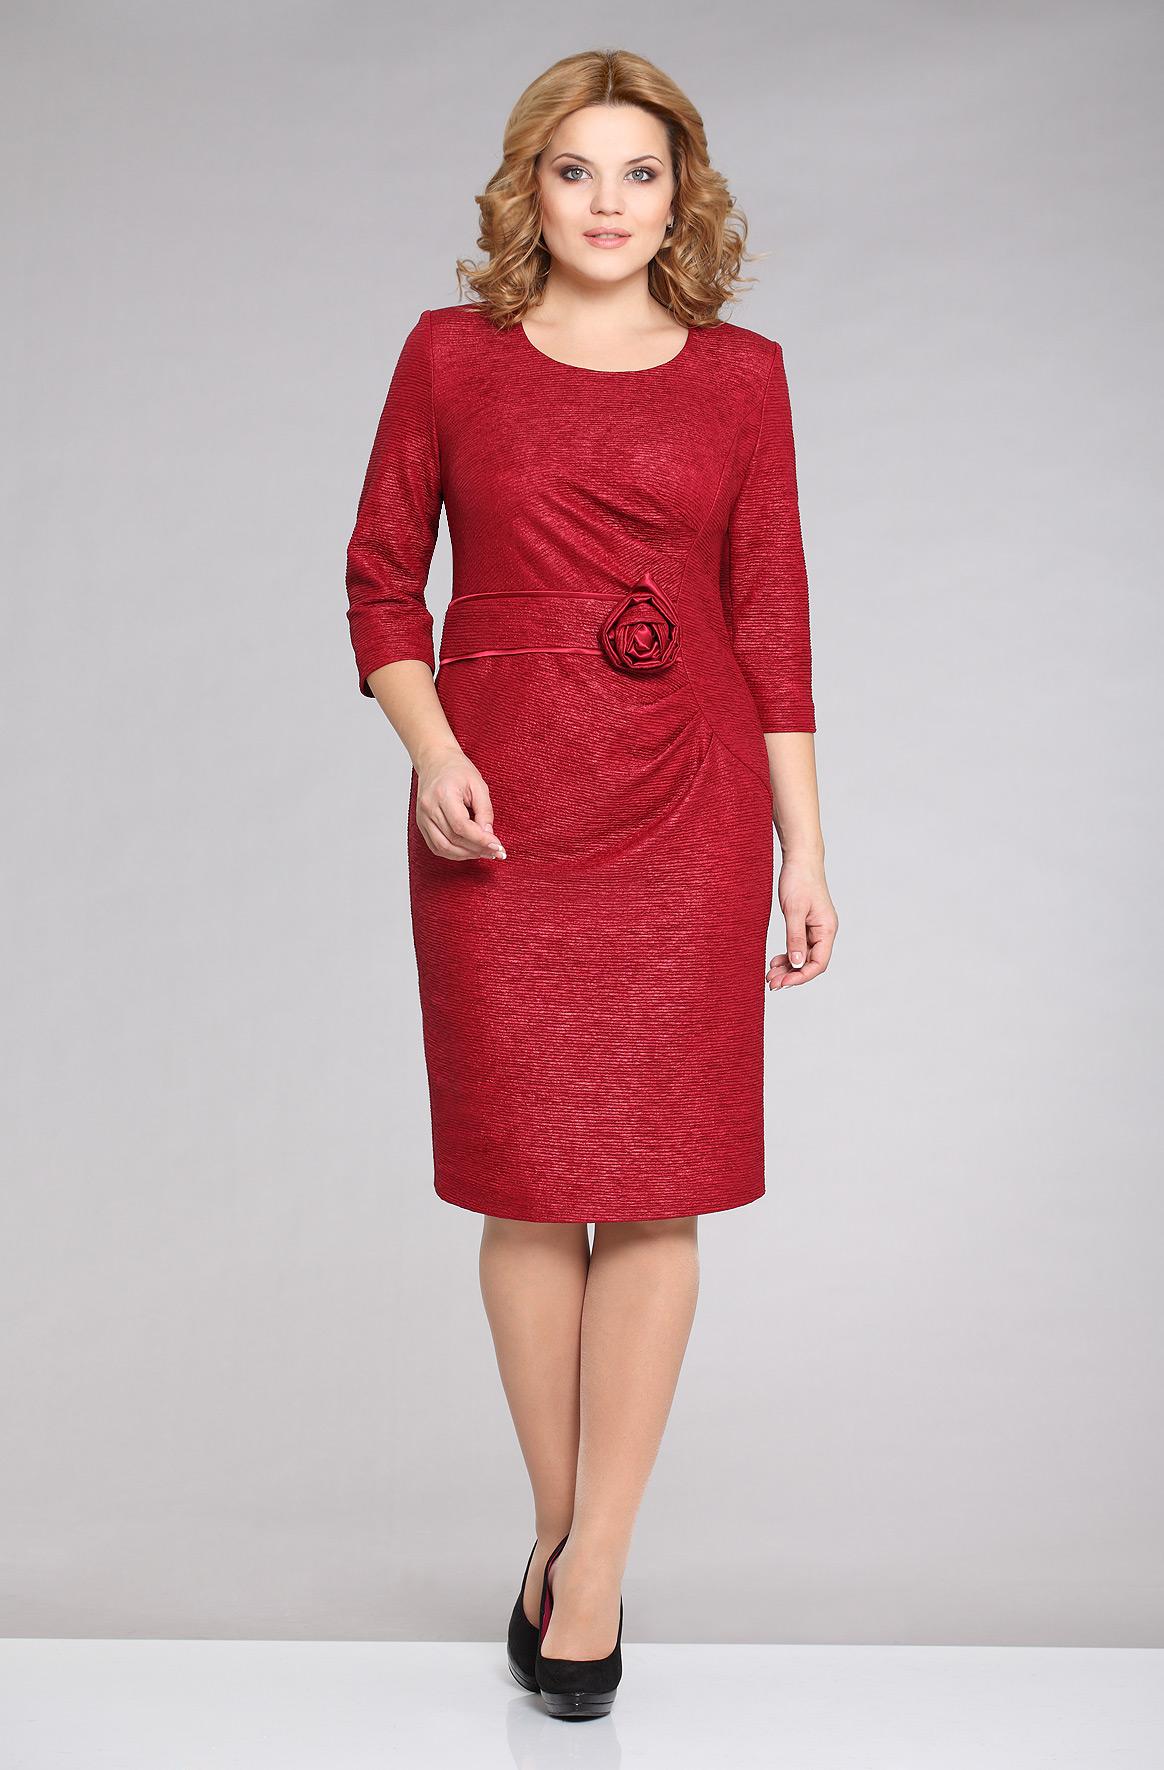 Red Code Одежда Интернет Магазин